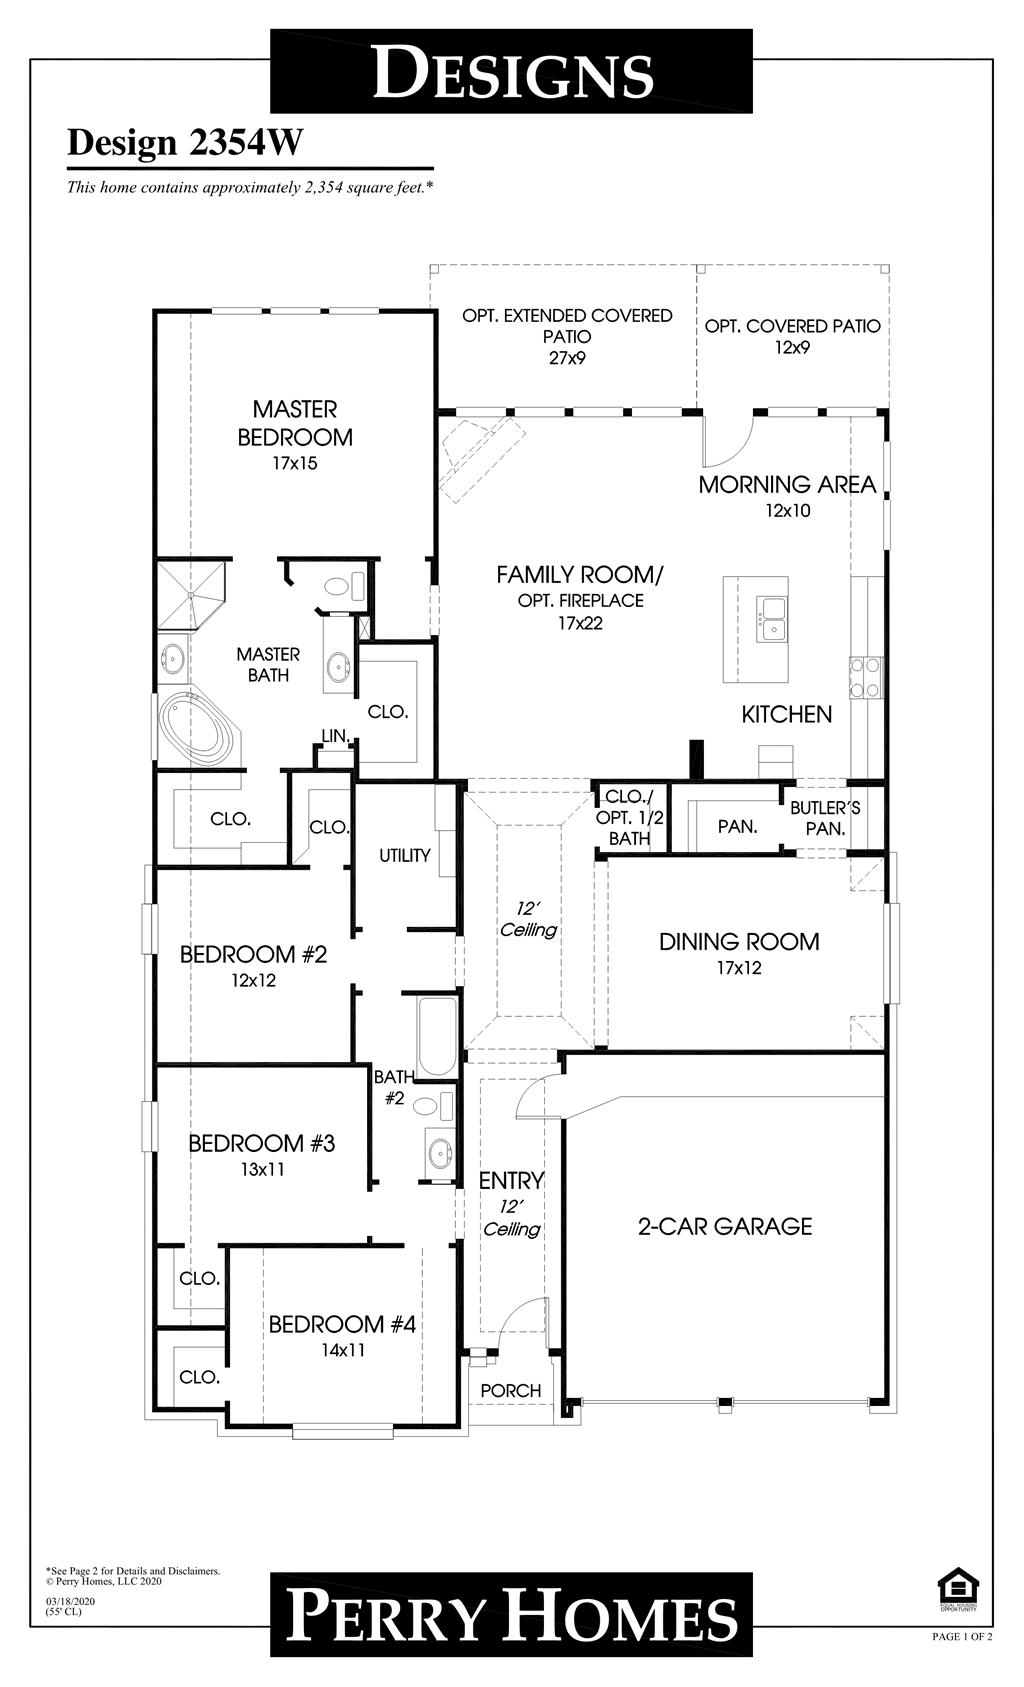 Floor Plan for 2354W